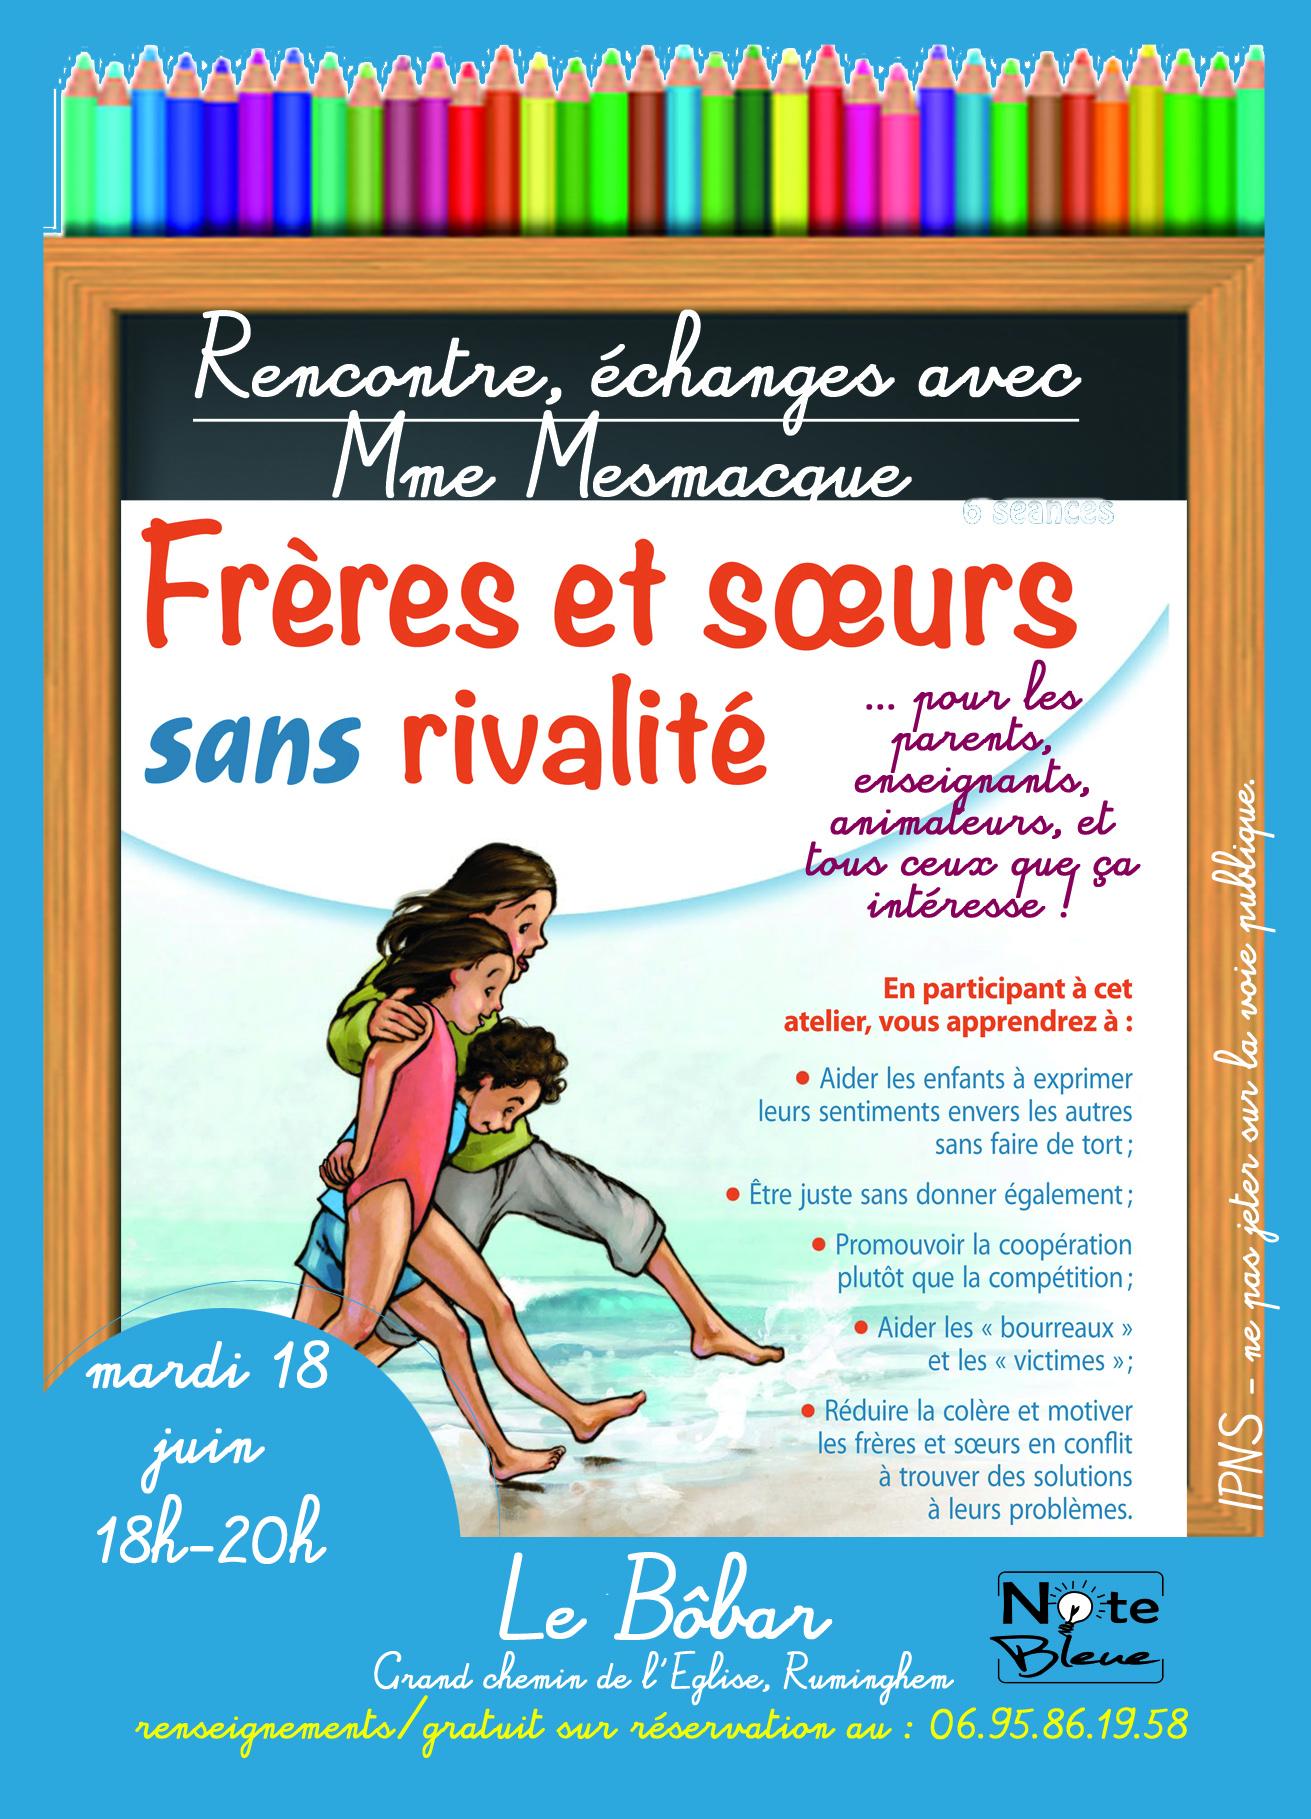 flyerfrereetsoeur18note-bleue